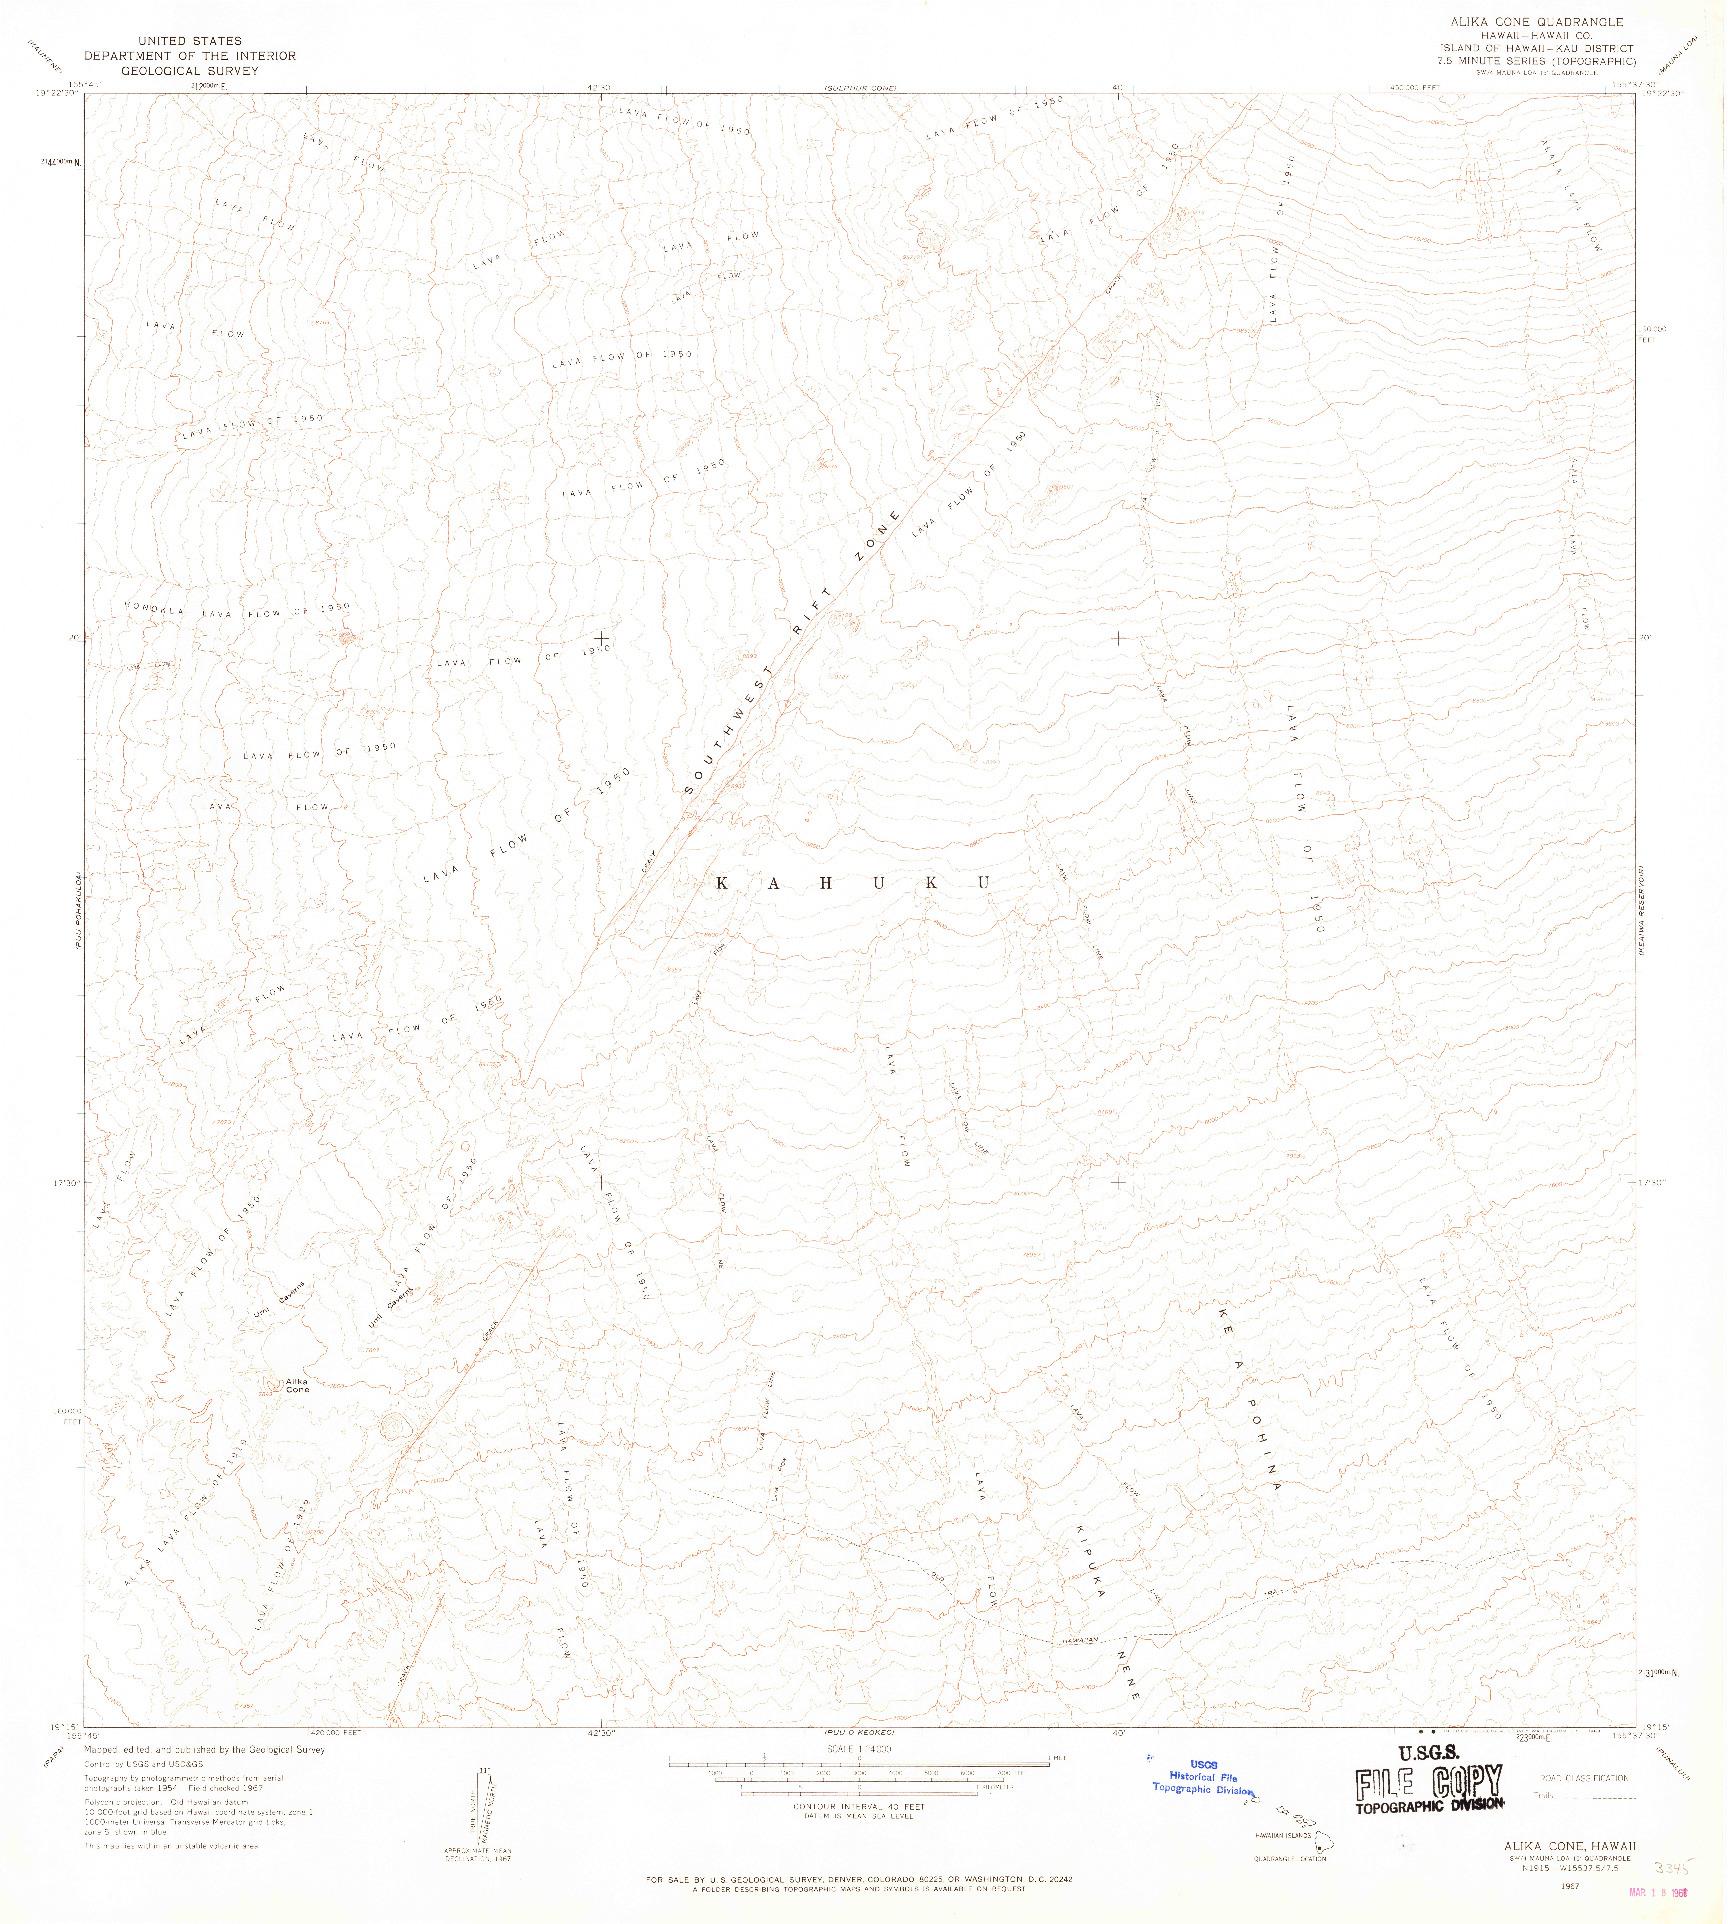 USGS 1:24000-SCALE QUADRANGLE FOR ALIKA CONE, HI 1967